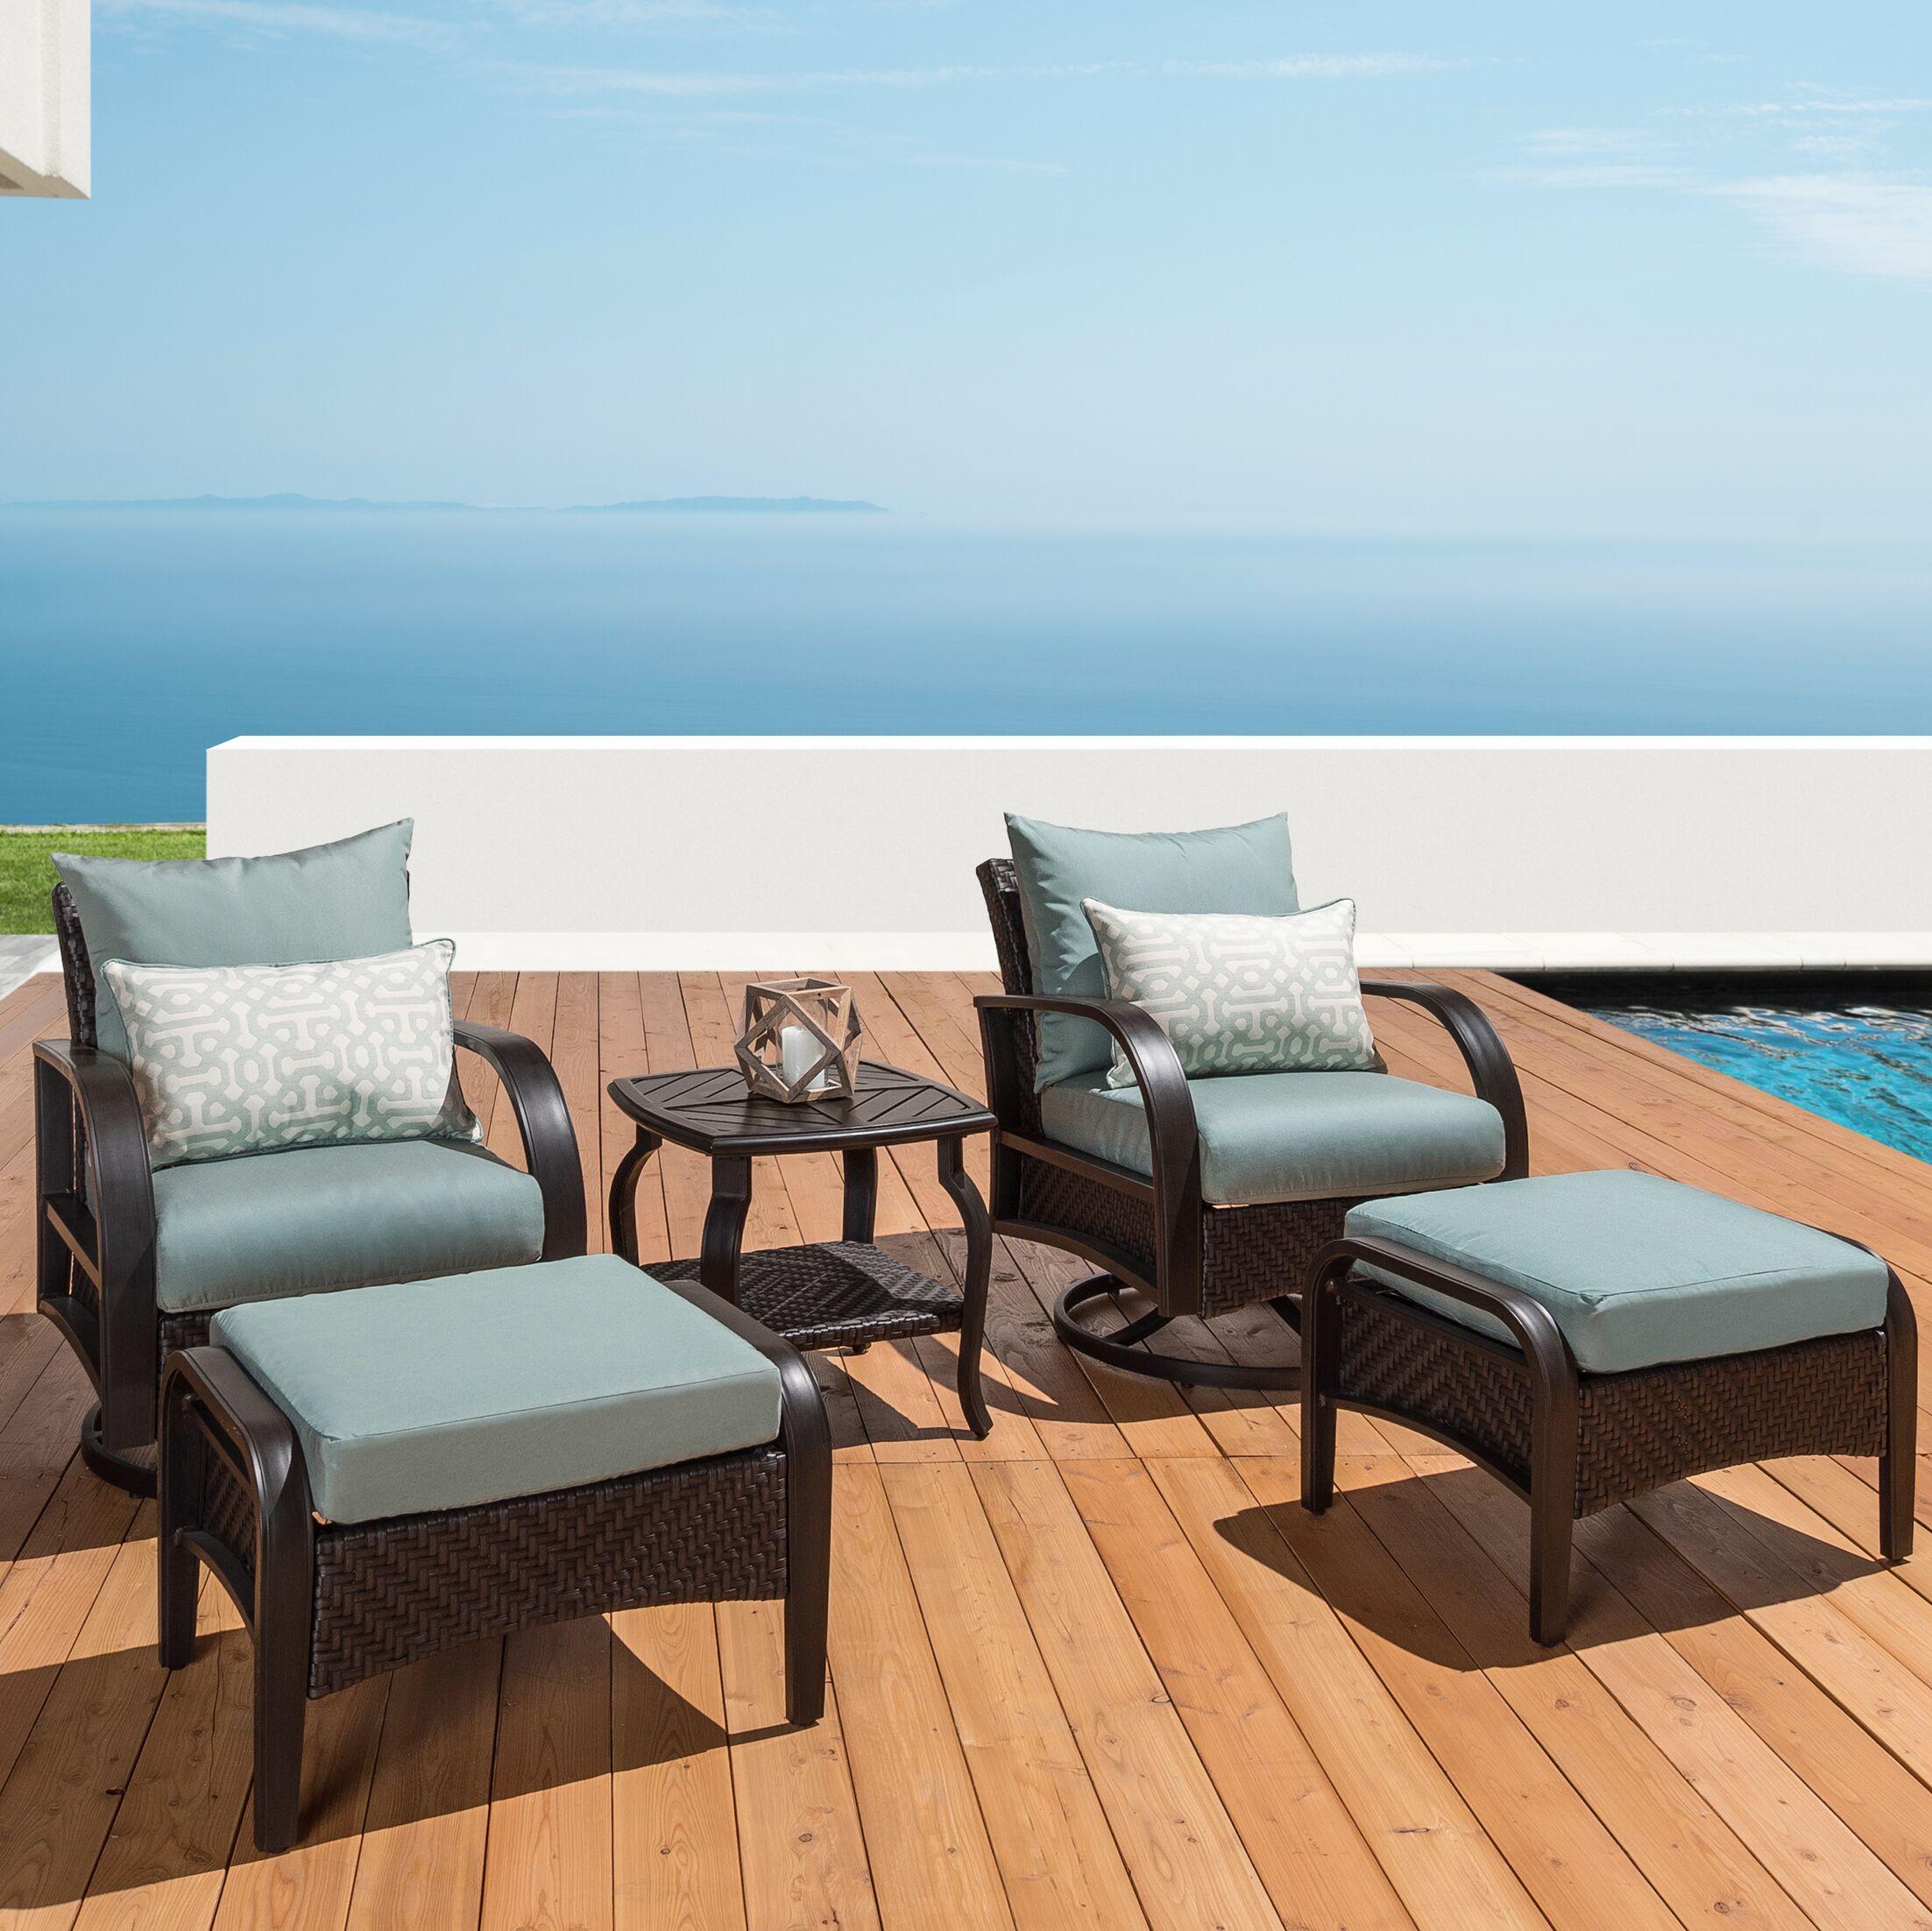 Cumberland 5 Piece Sunbrella Conversation Set with Cushions Cushion Color: Spa Blue/White